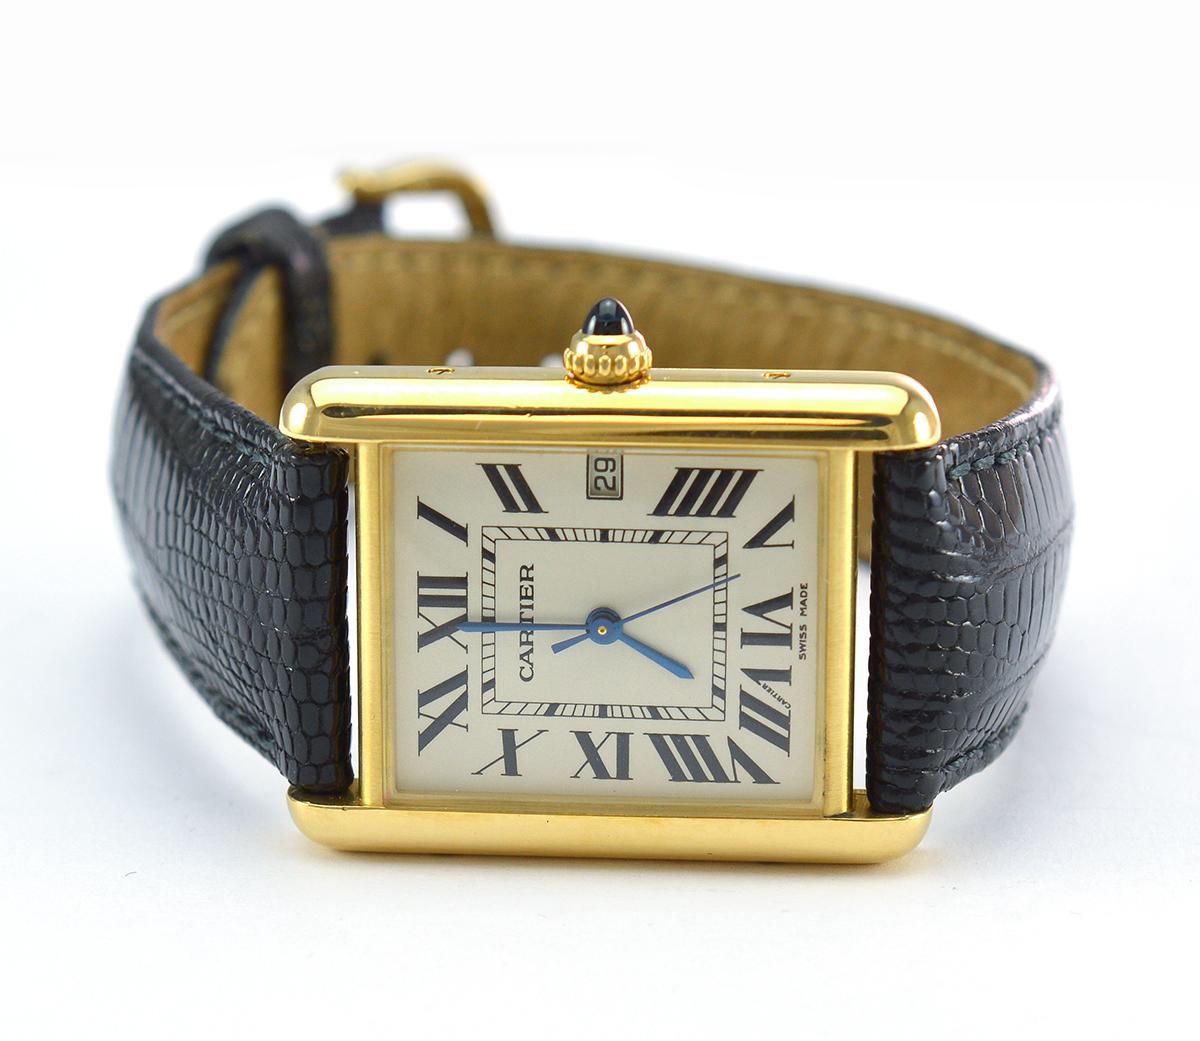 Cartier Tank Louis 18k Gold Ivory Dial Watch On Black